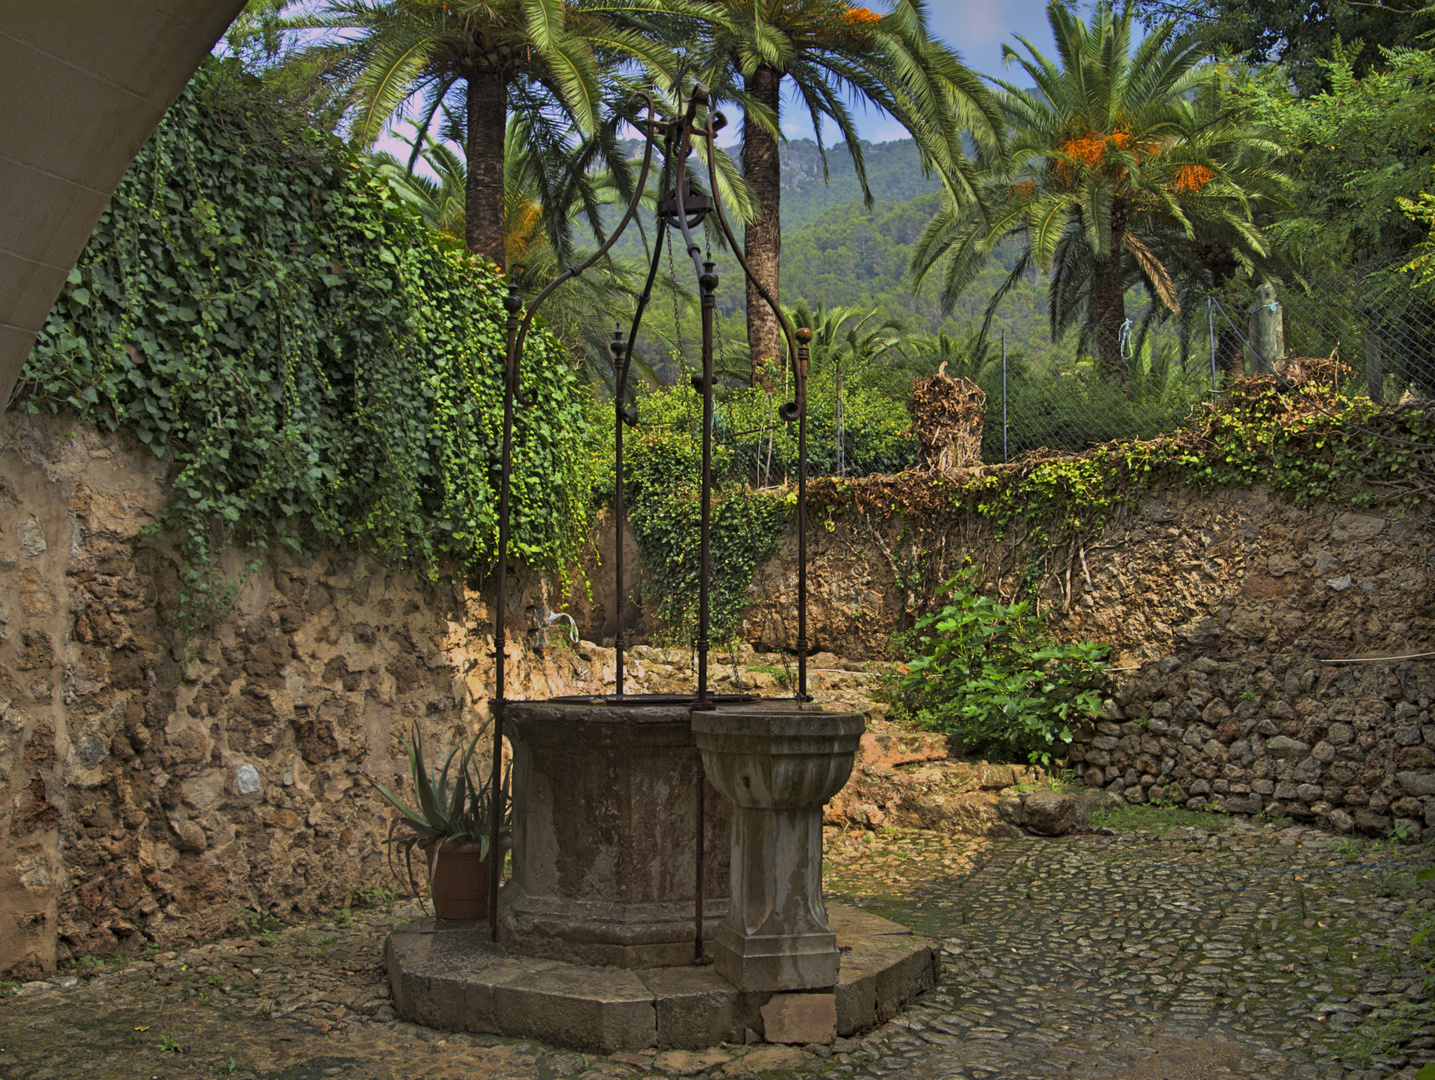 Brunnen im Hinterhof